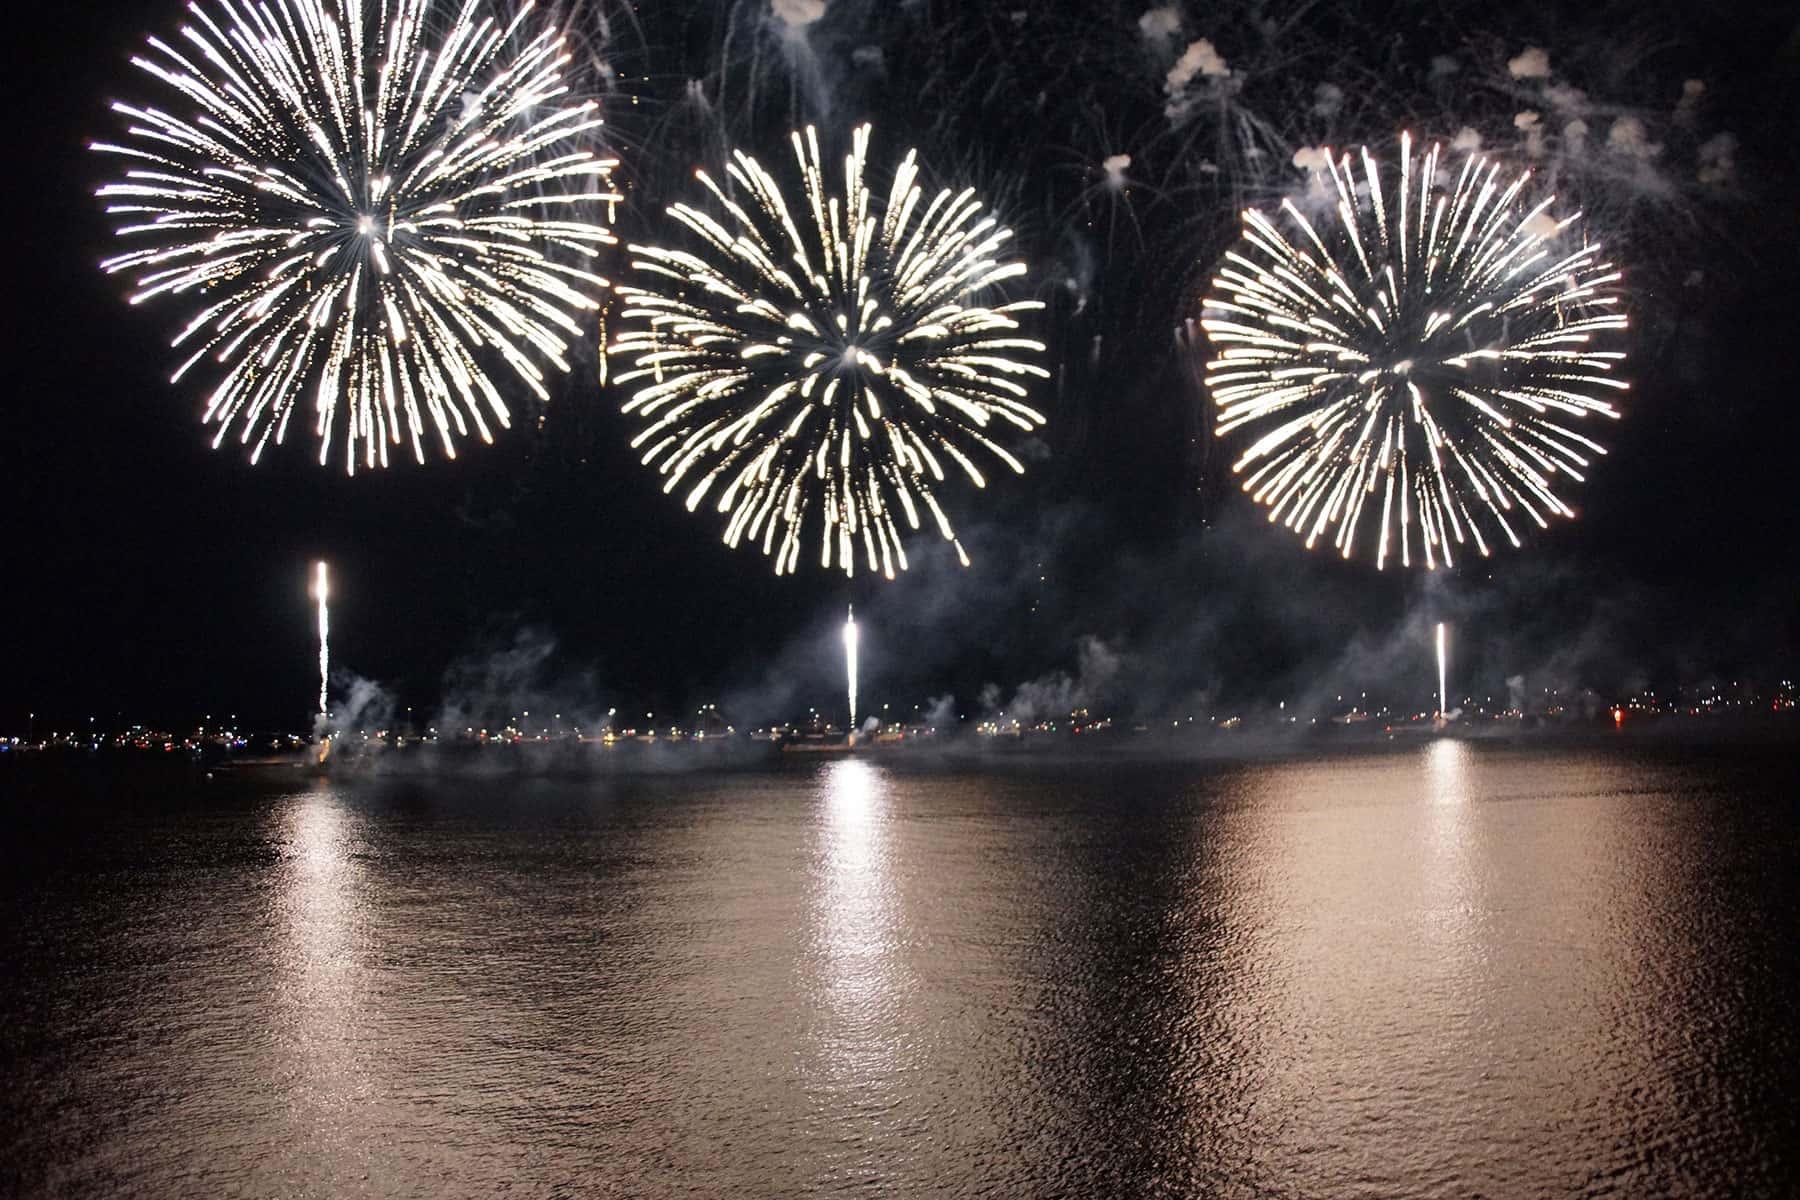 070317_july3rdfireworks_636